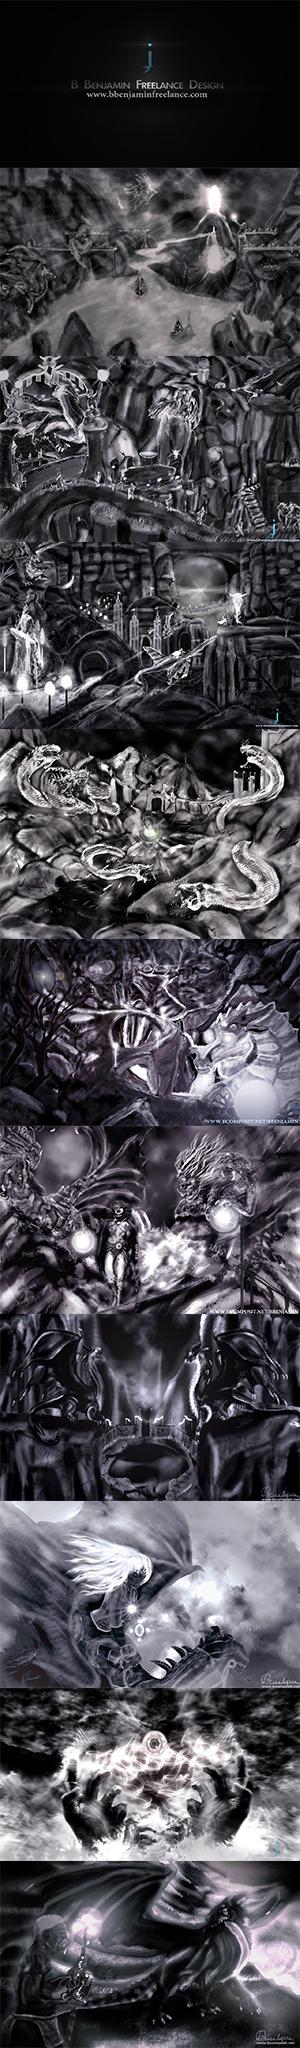 Ritual Serires (in order) by ZirBenjamin